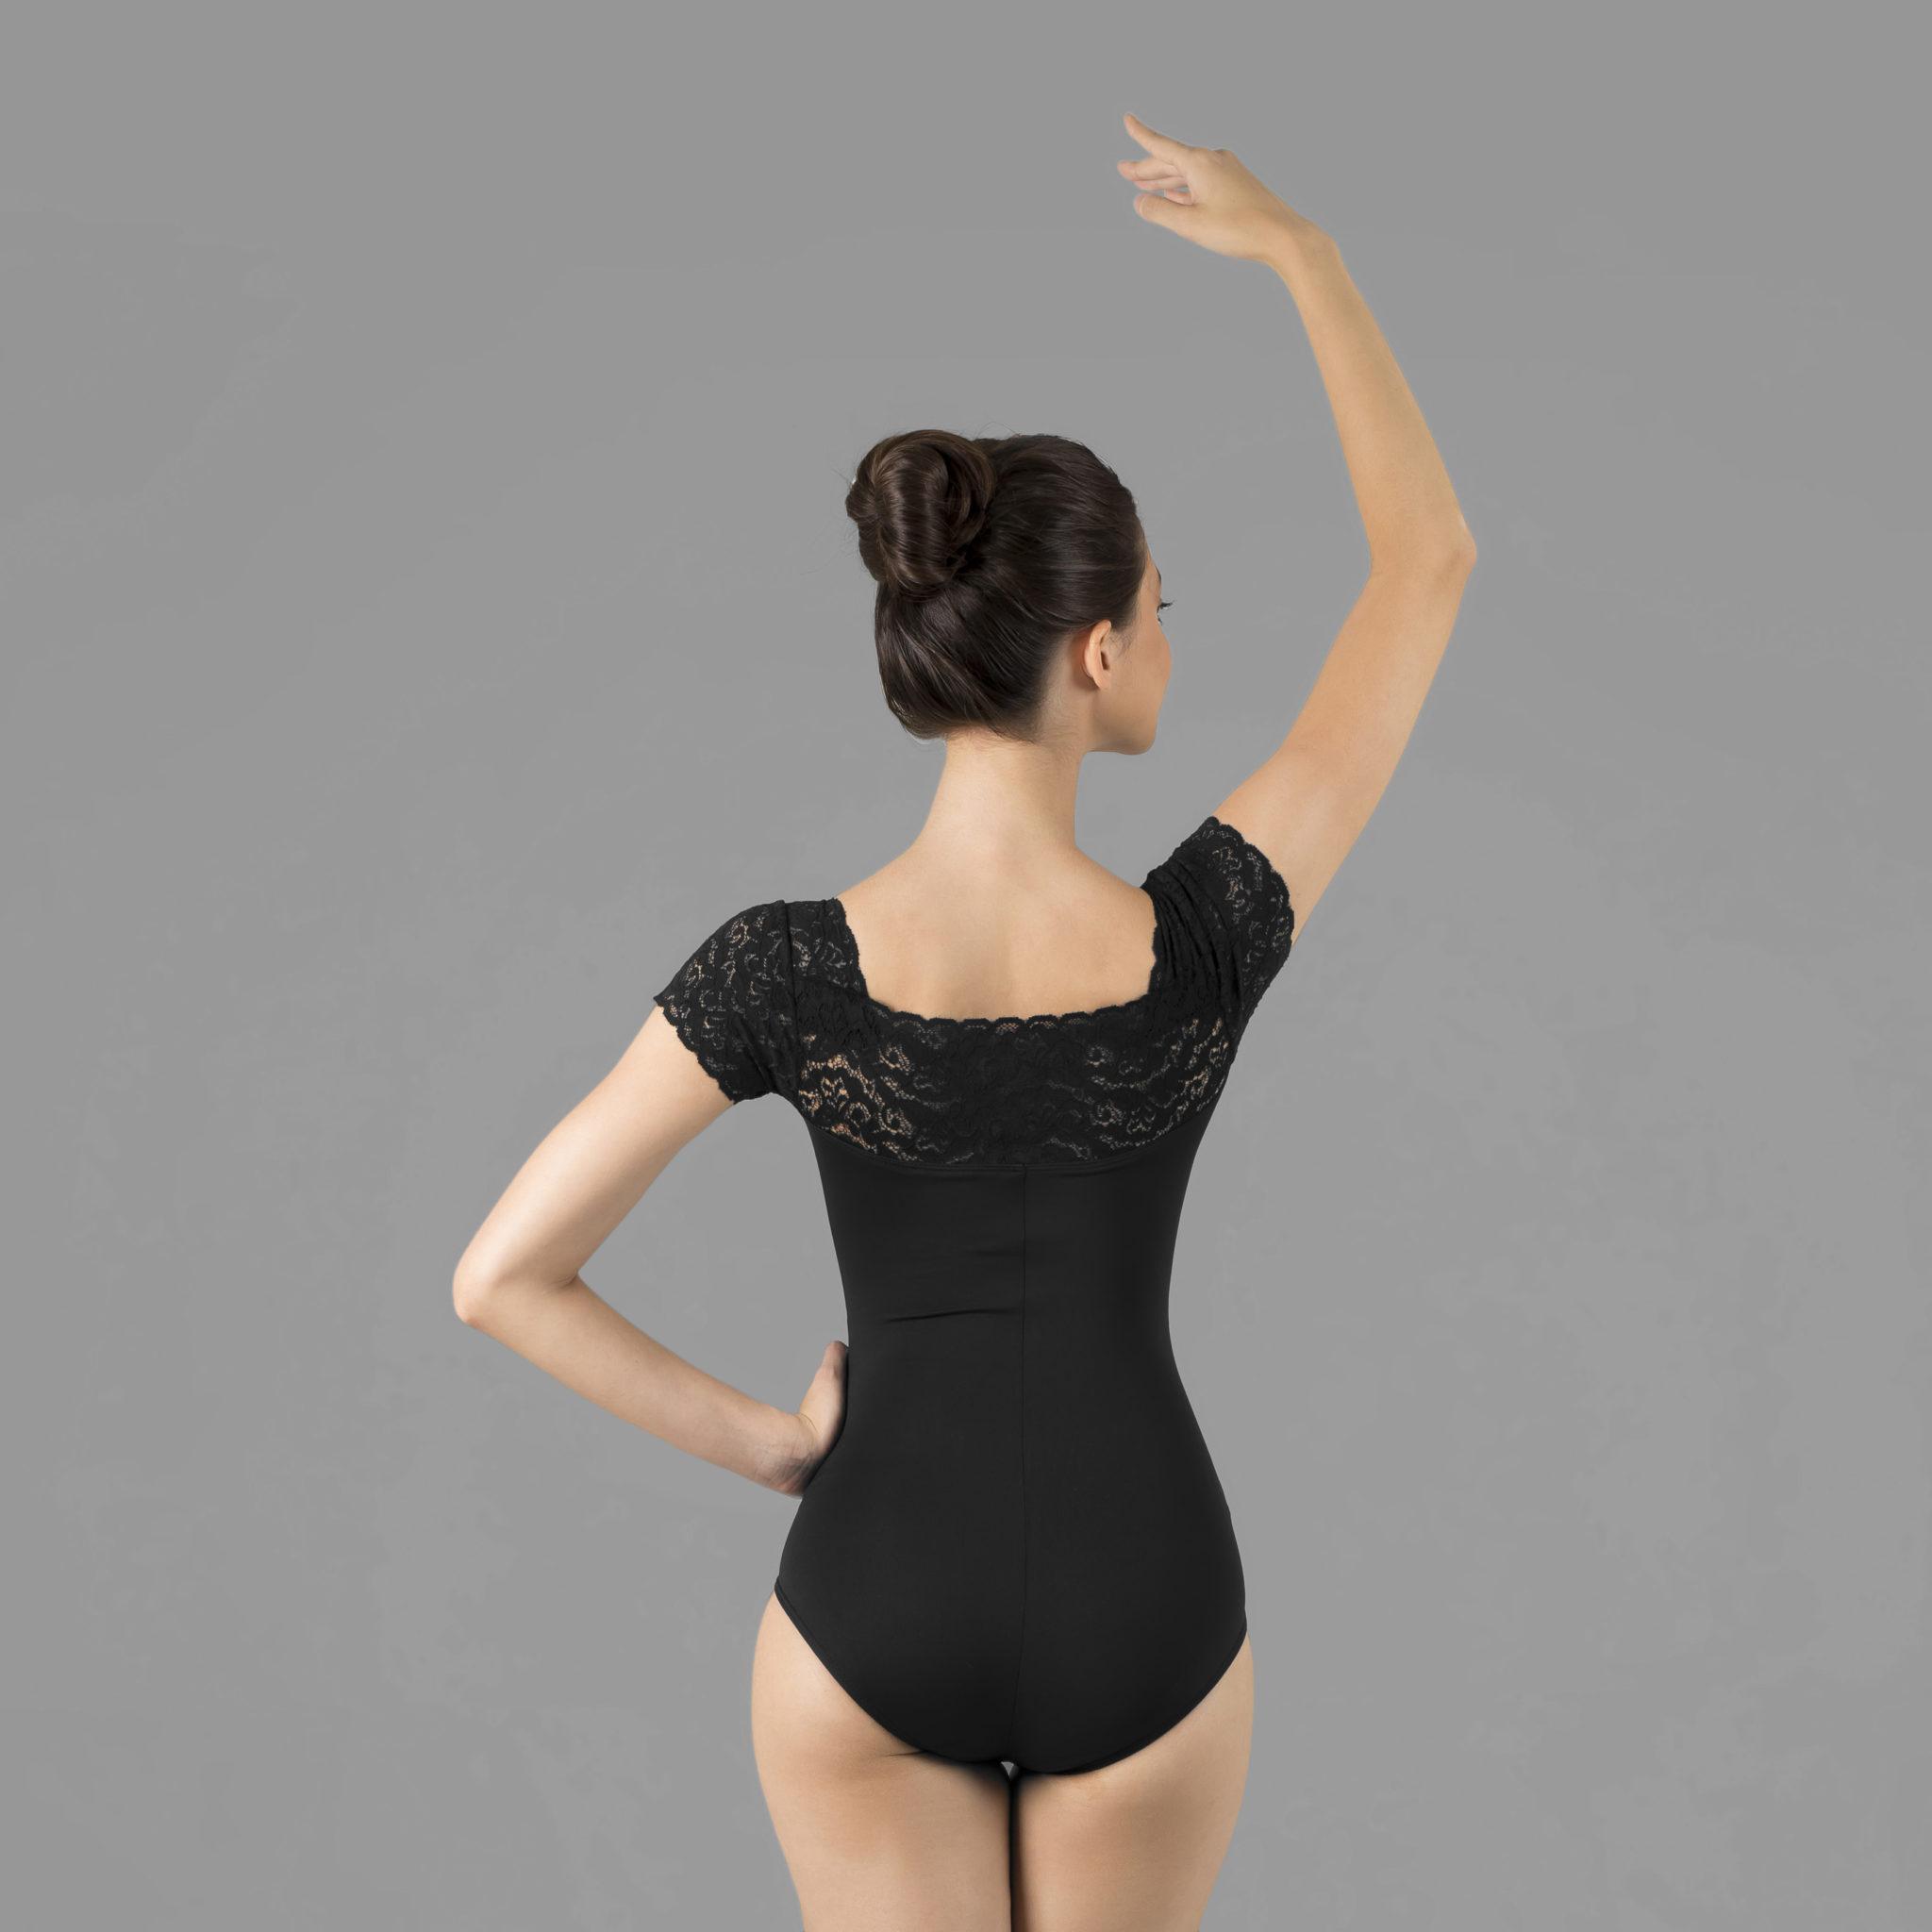 2a2b2852fd Collant Em Amni Com Renda 527 - Evidence Ballet - Loja Virtual